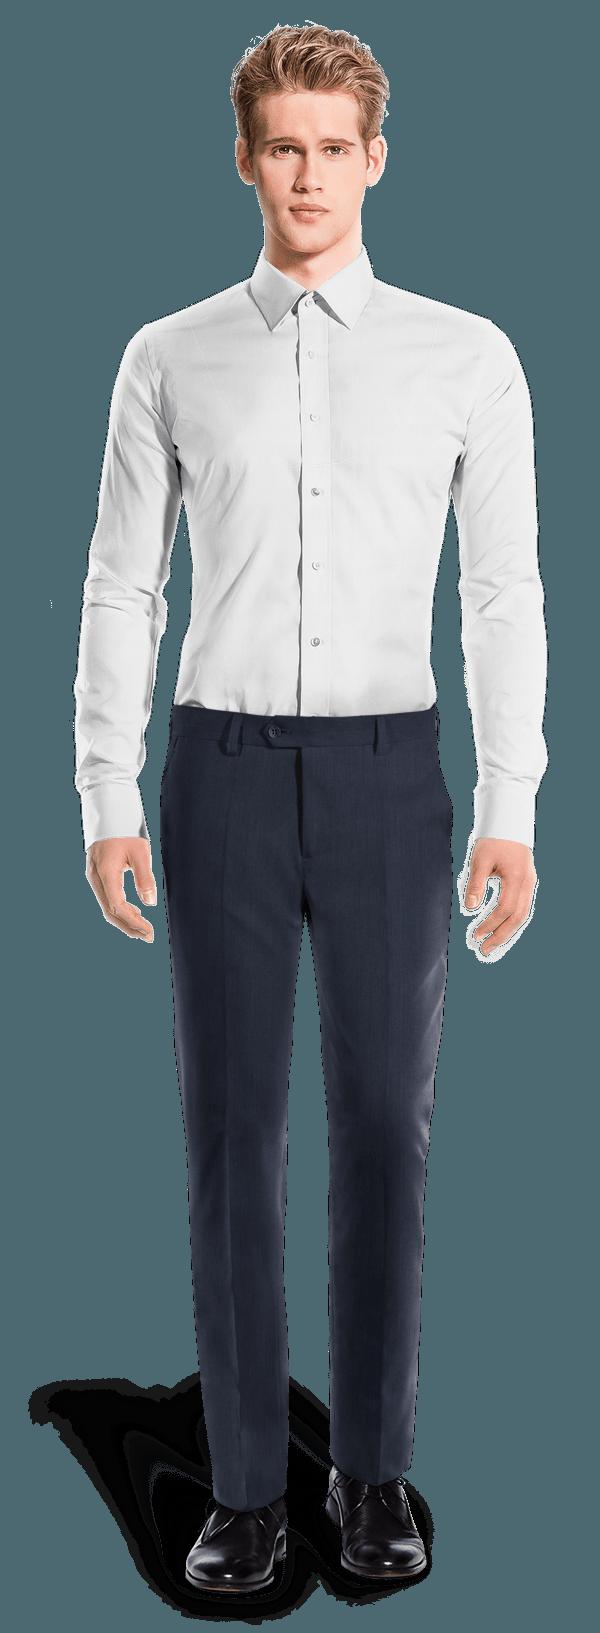 Blaue gerade Passform Hose aus Leinen